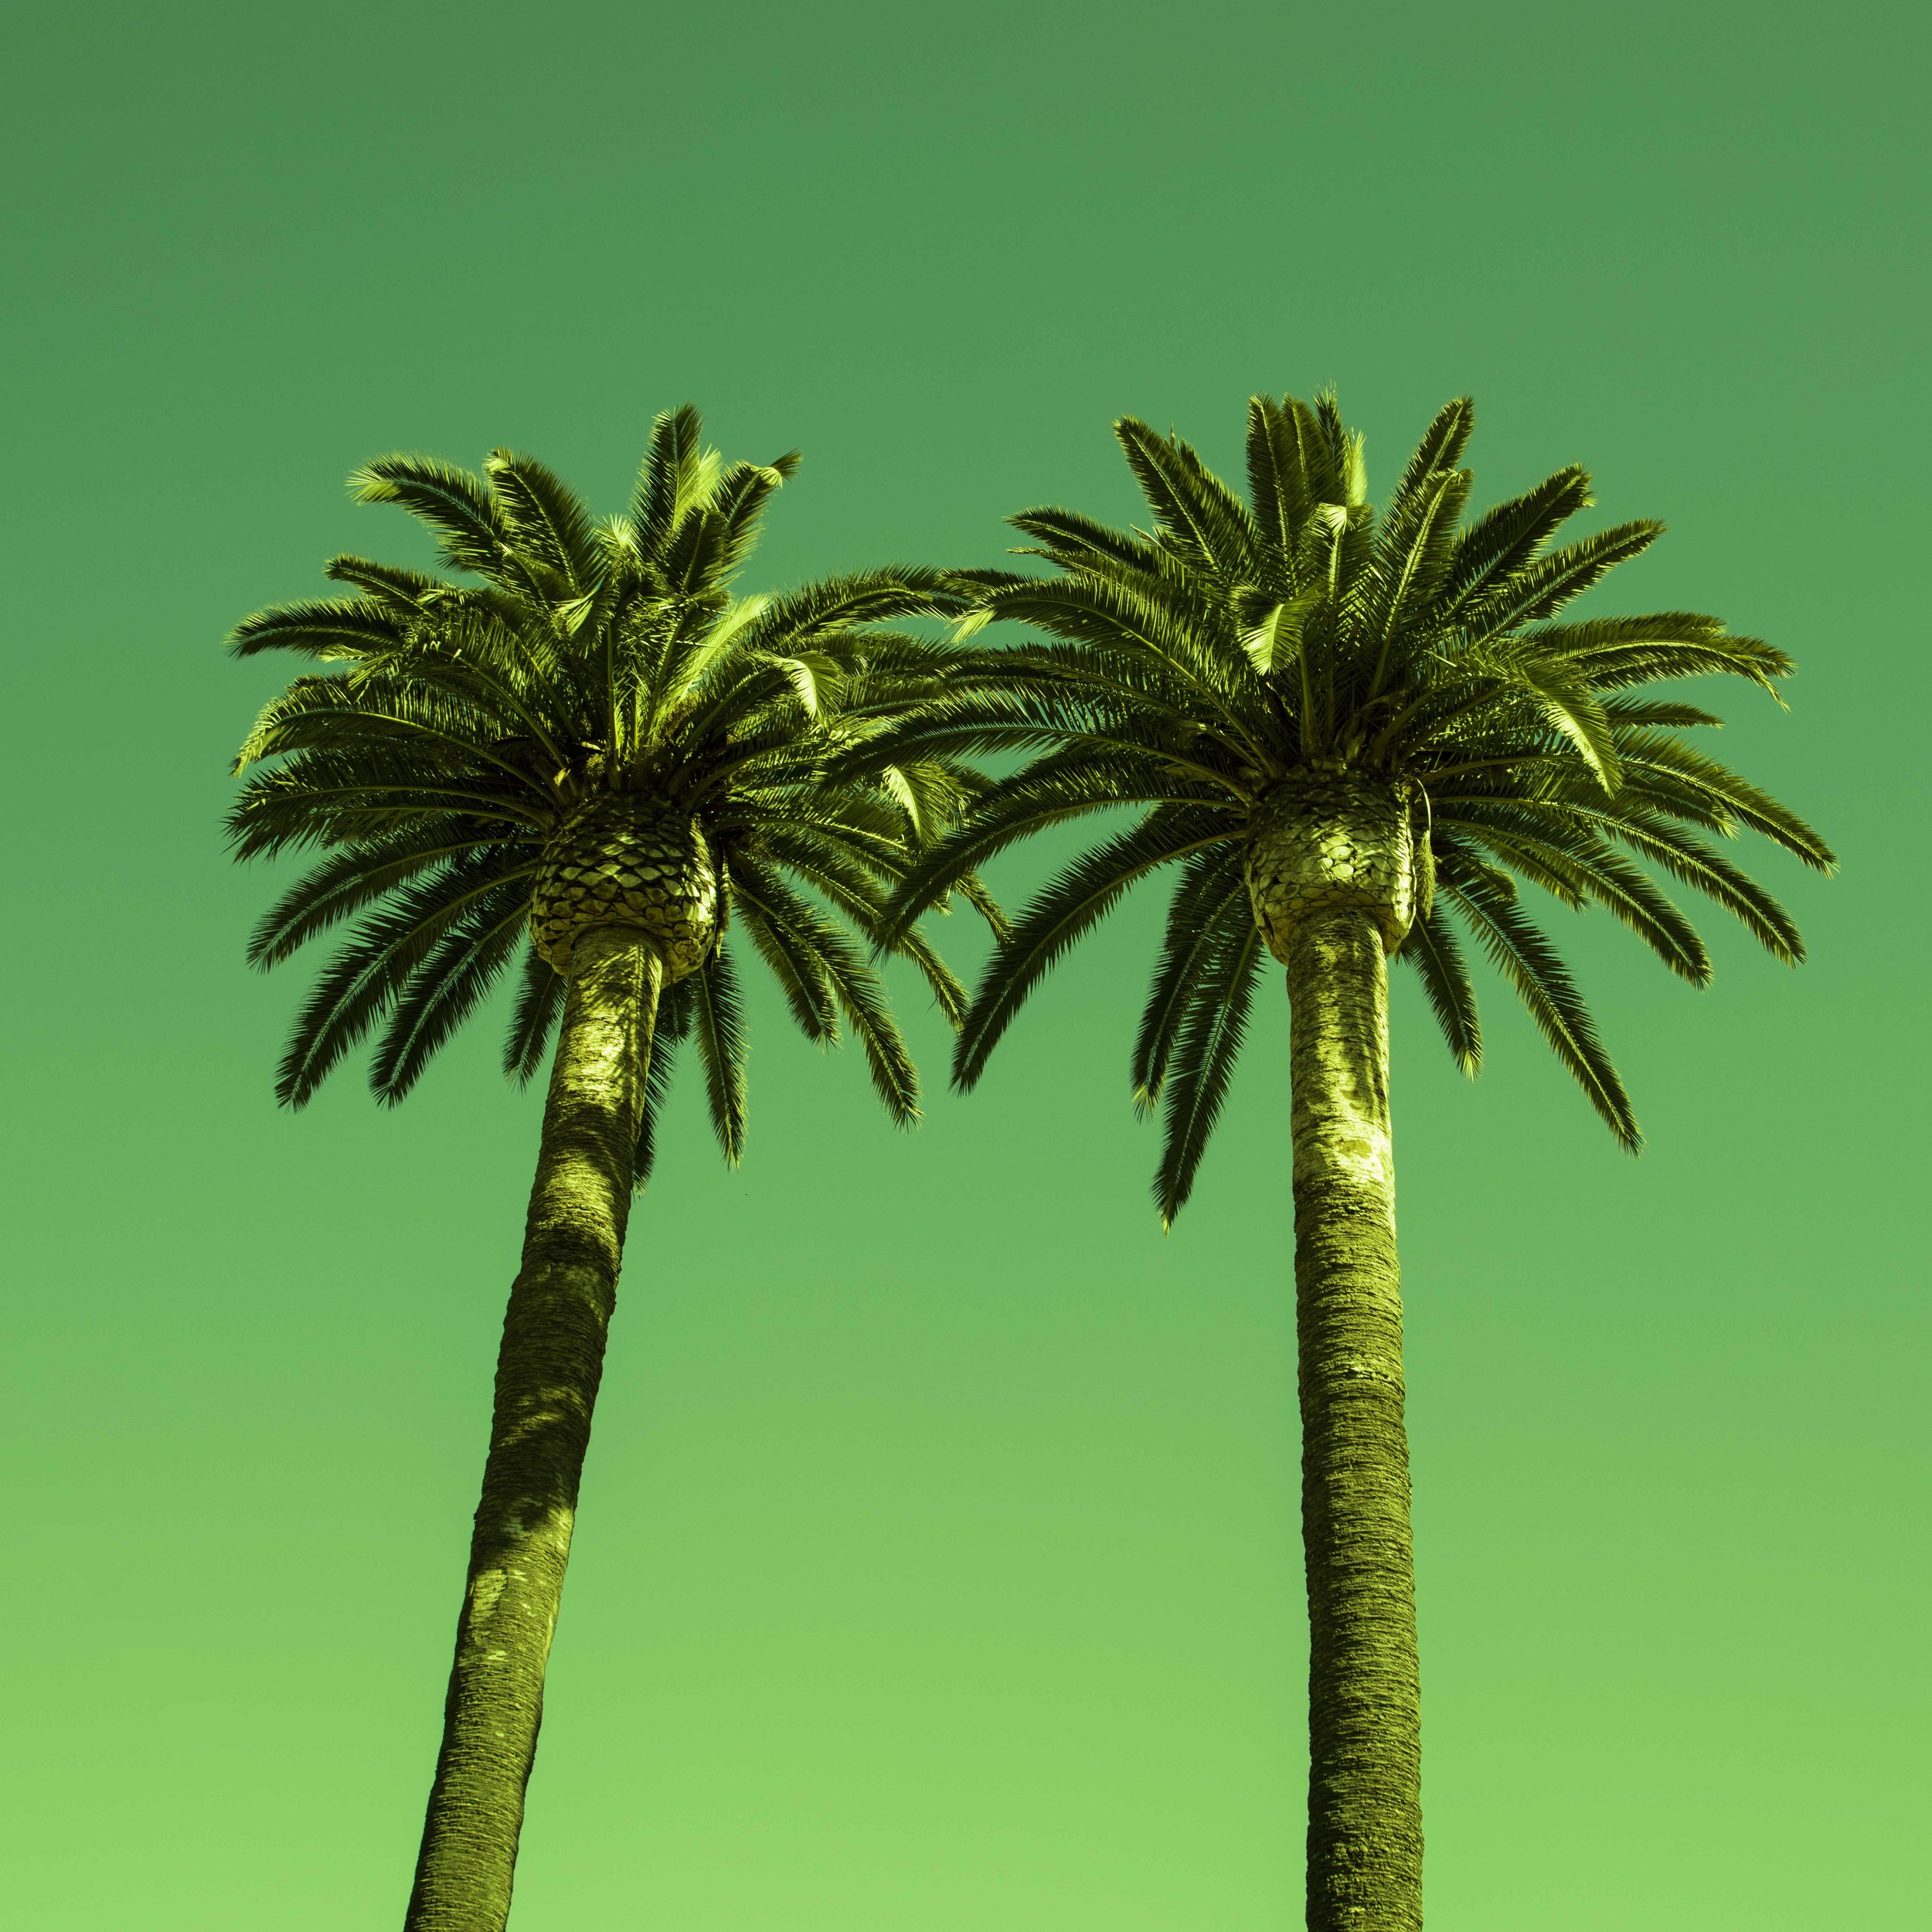 PALM_TREES-5838_V2.jpg